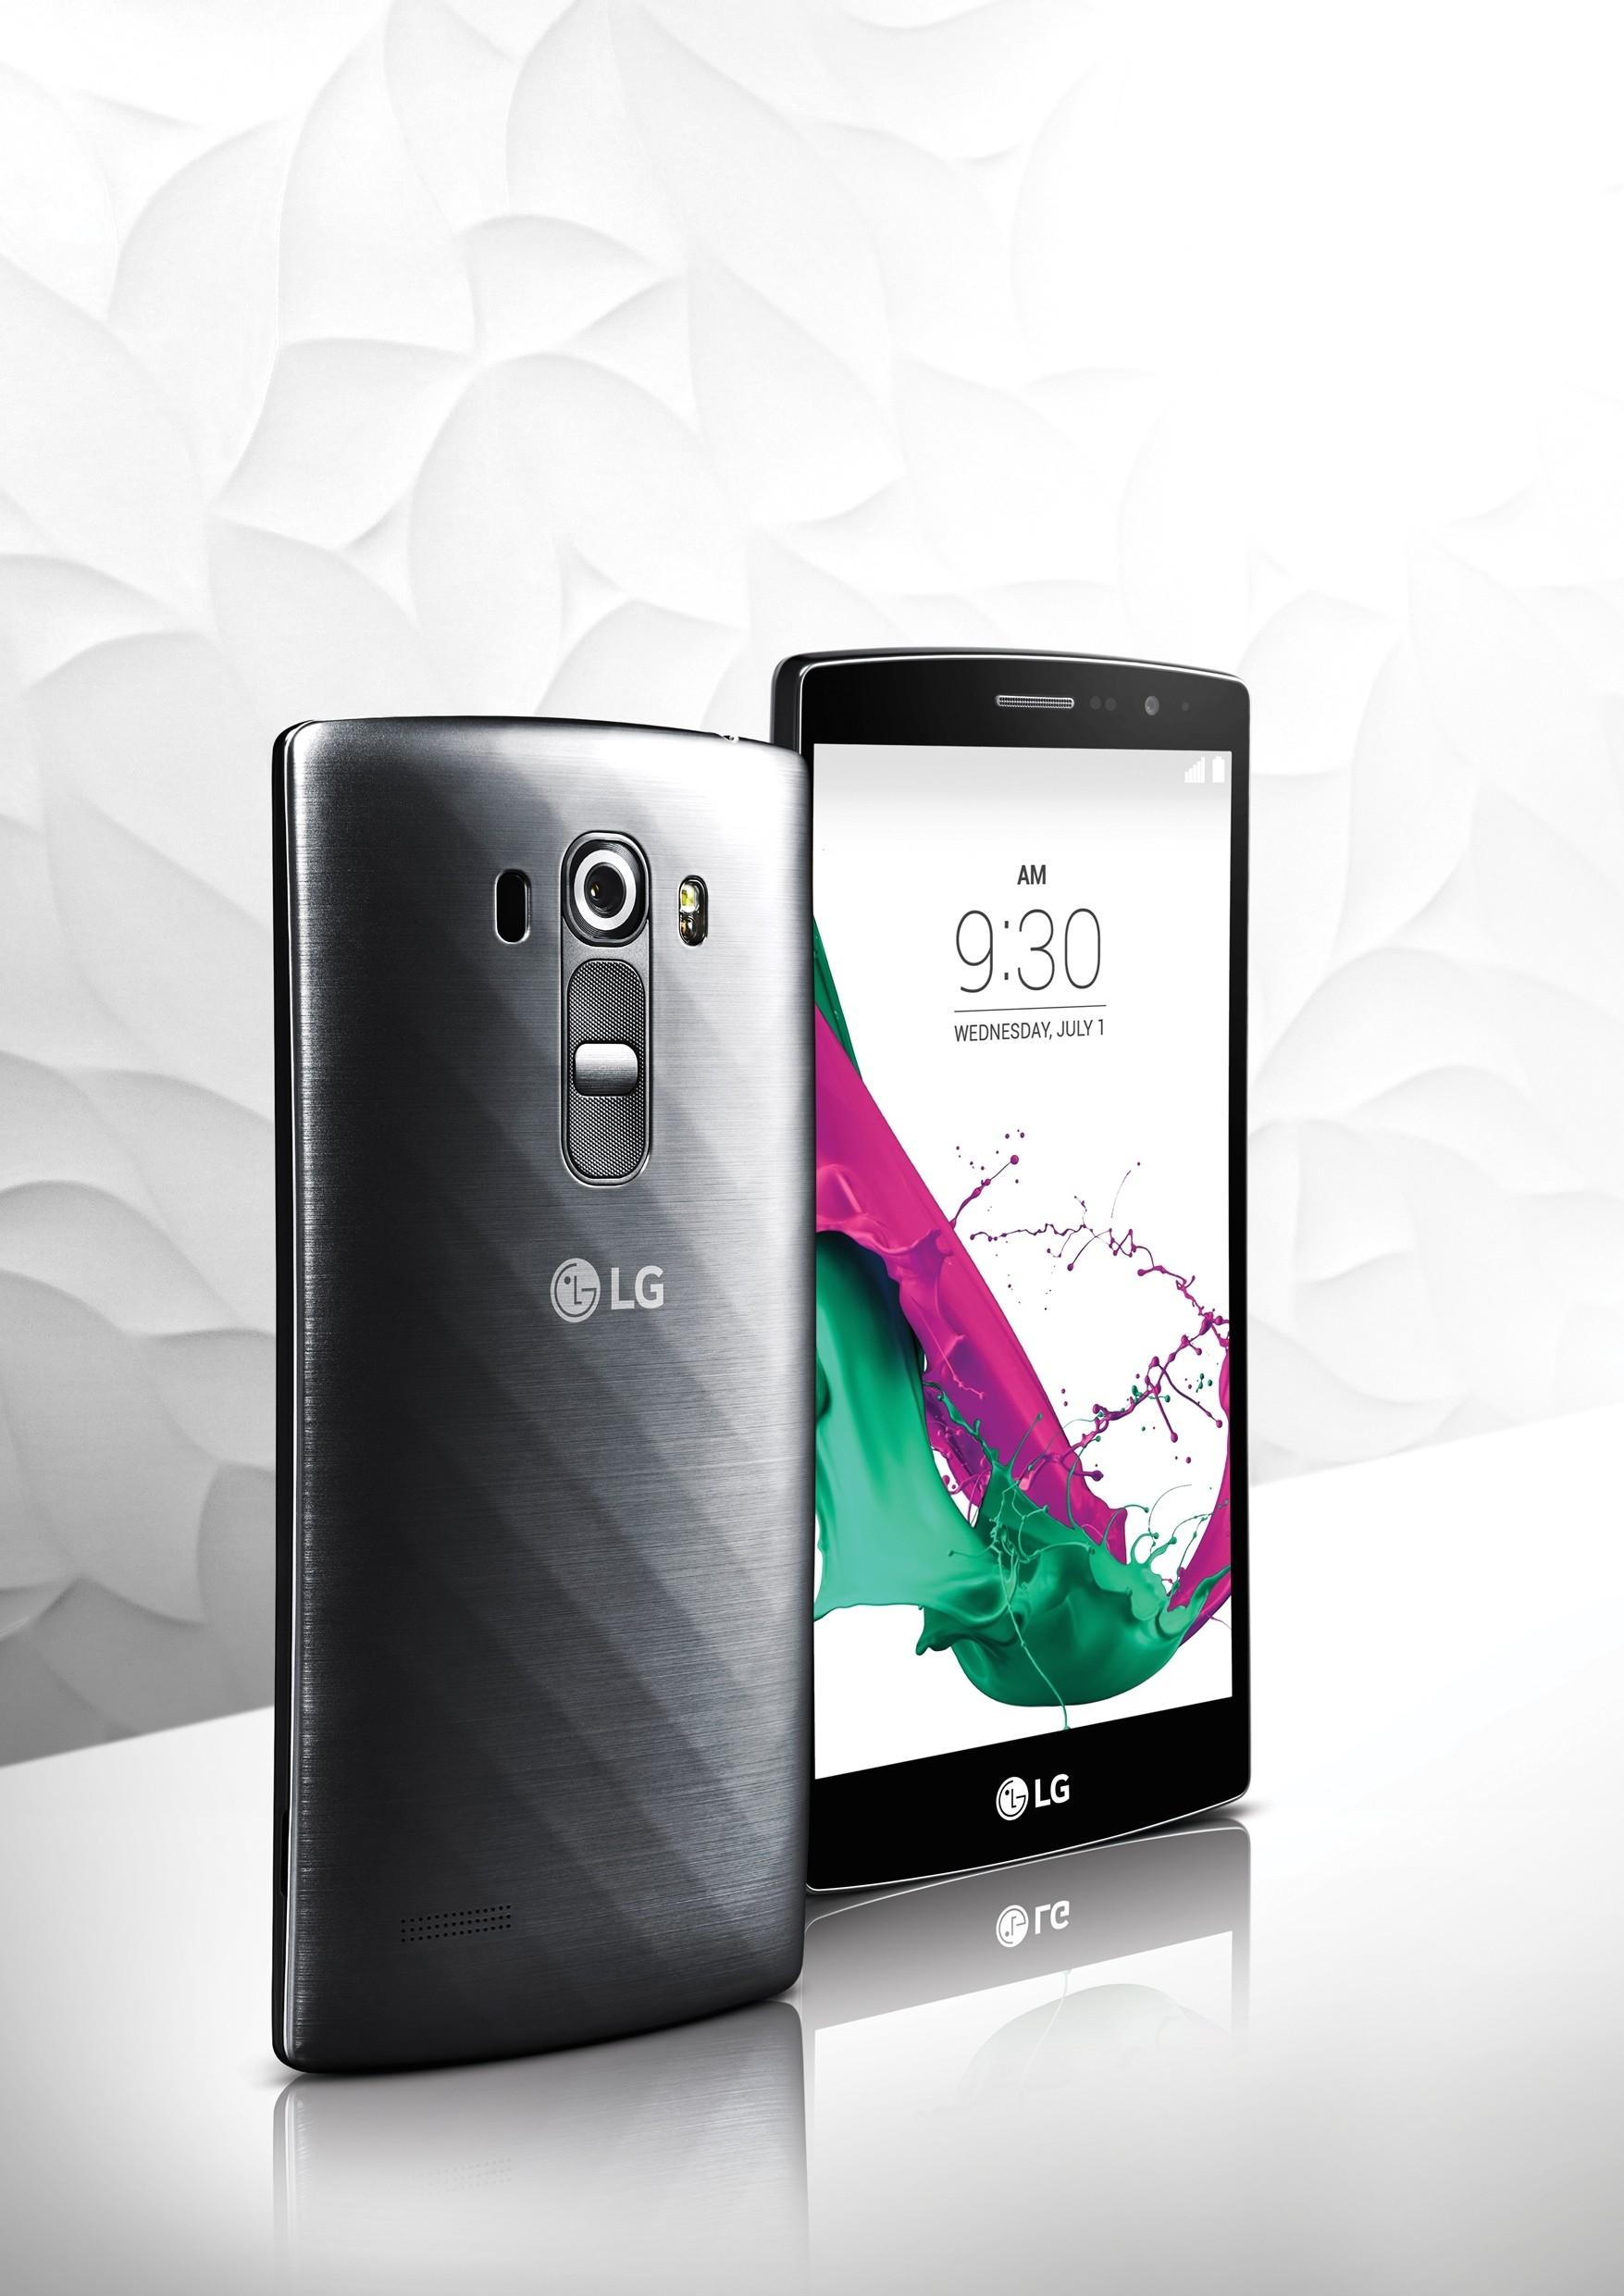 LG_G4s_Metallic Skin scura